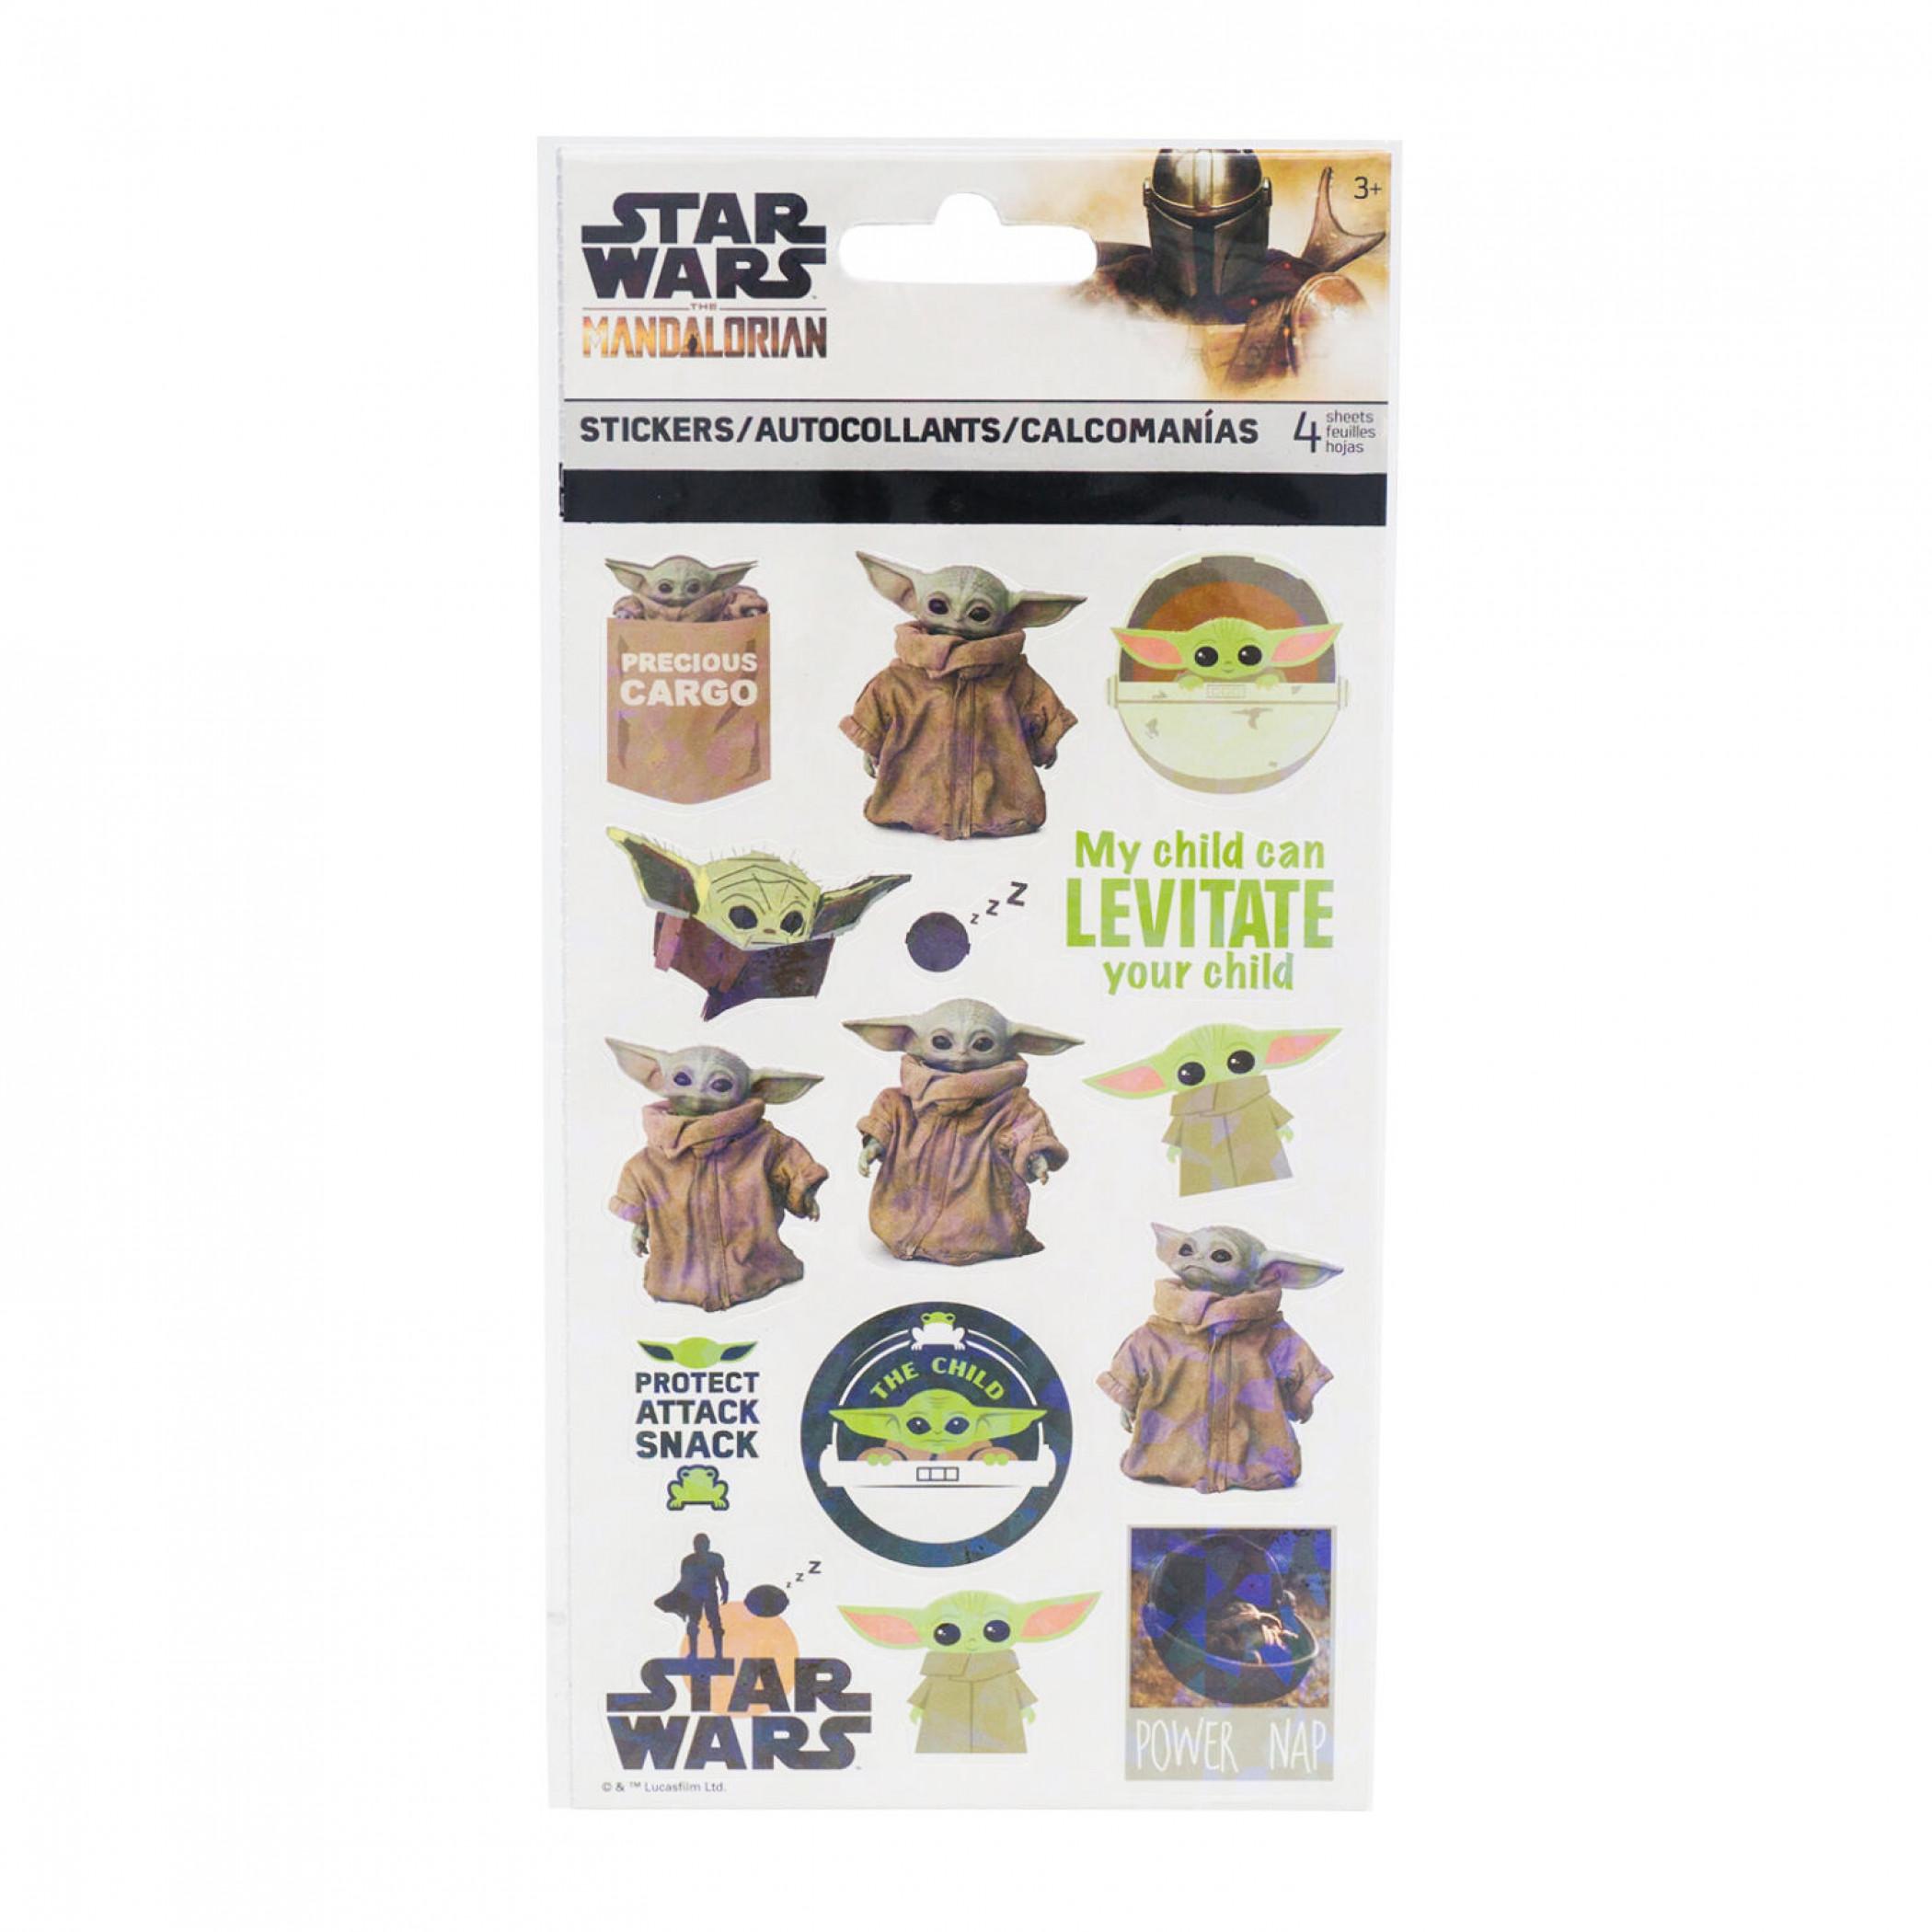 Star Wars The Mandalorian The Child Grogu Sticker Sheet 4-Pack